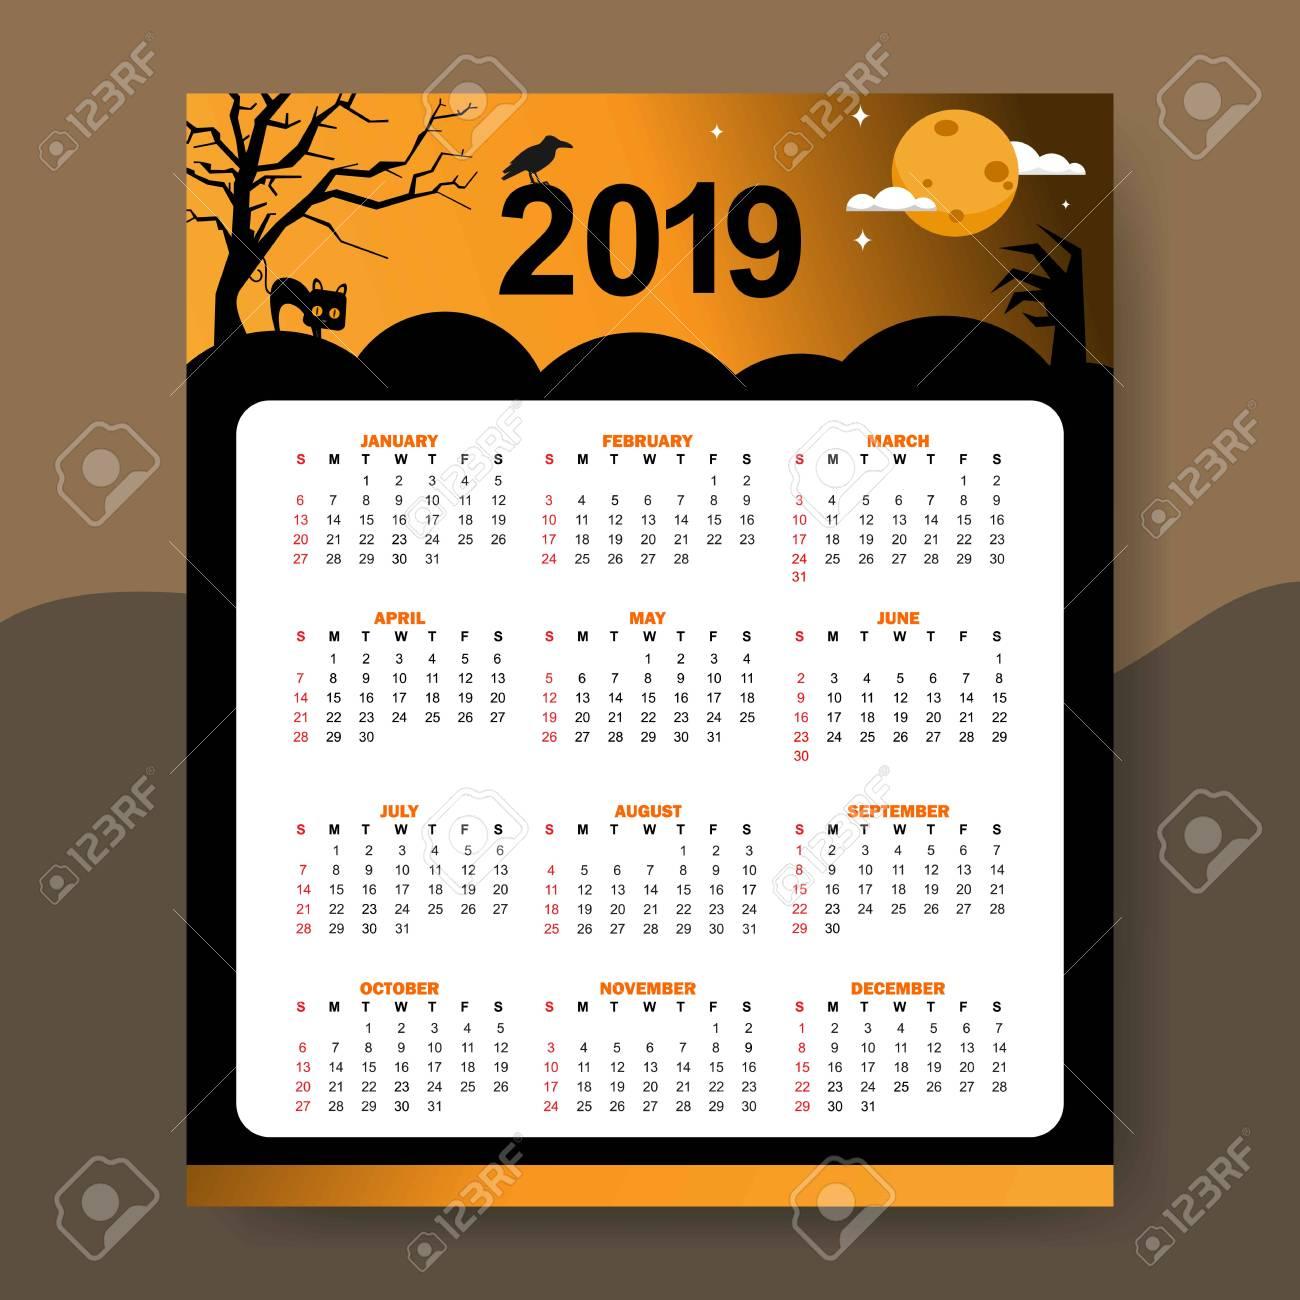 Halloween Calendar 2019 Calendar 2019 Halloween Theme Design Template Vector Illustration